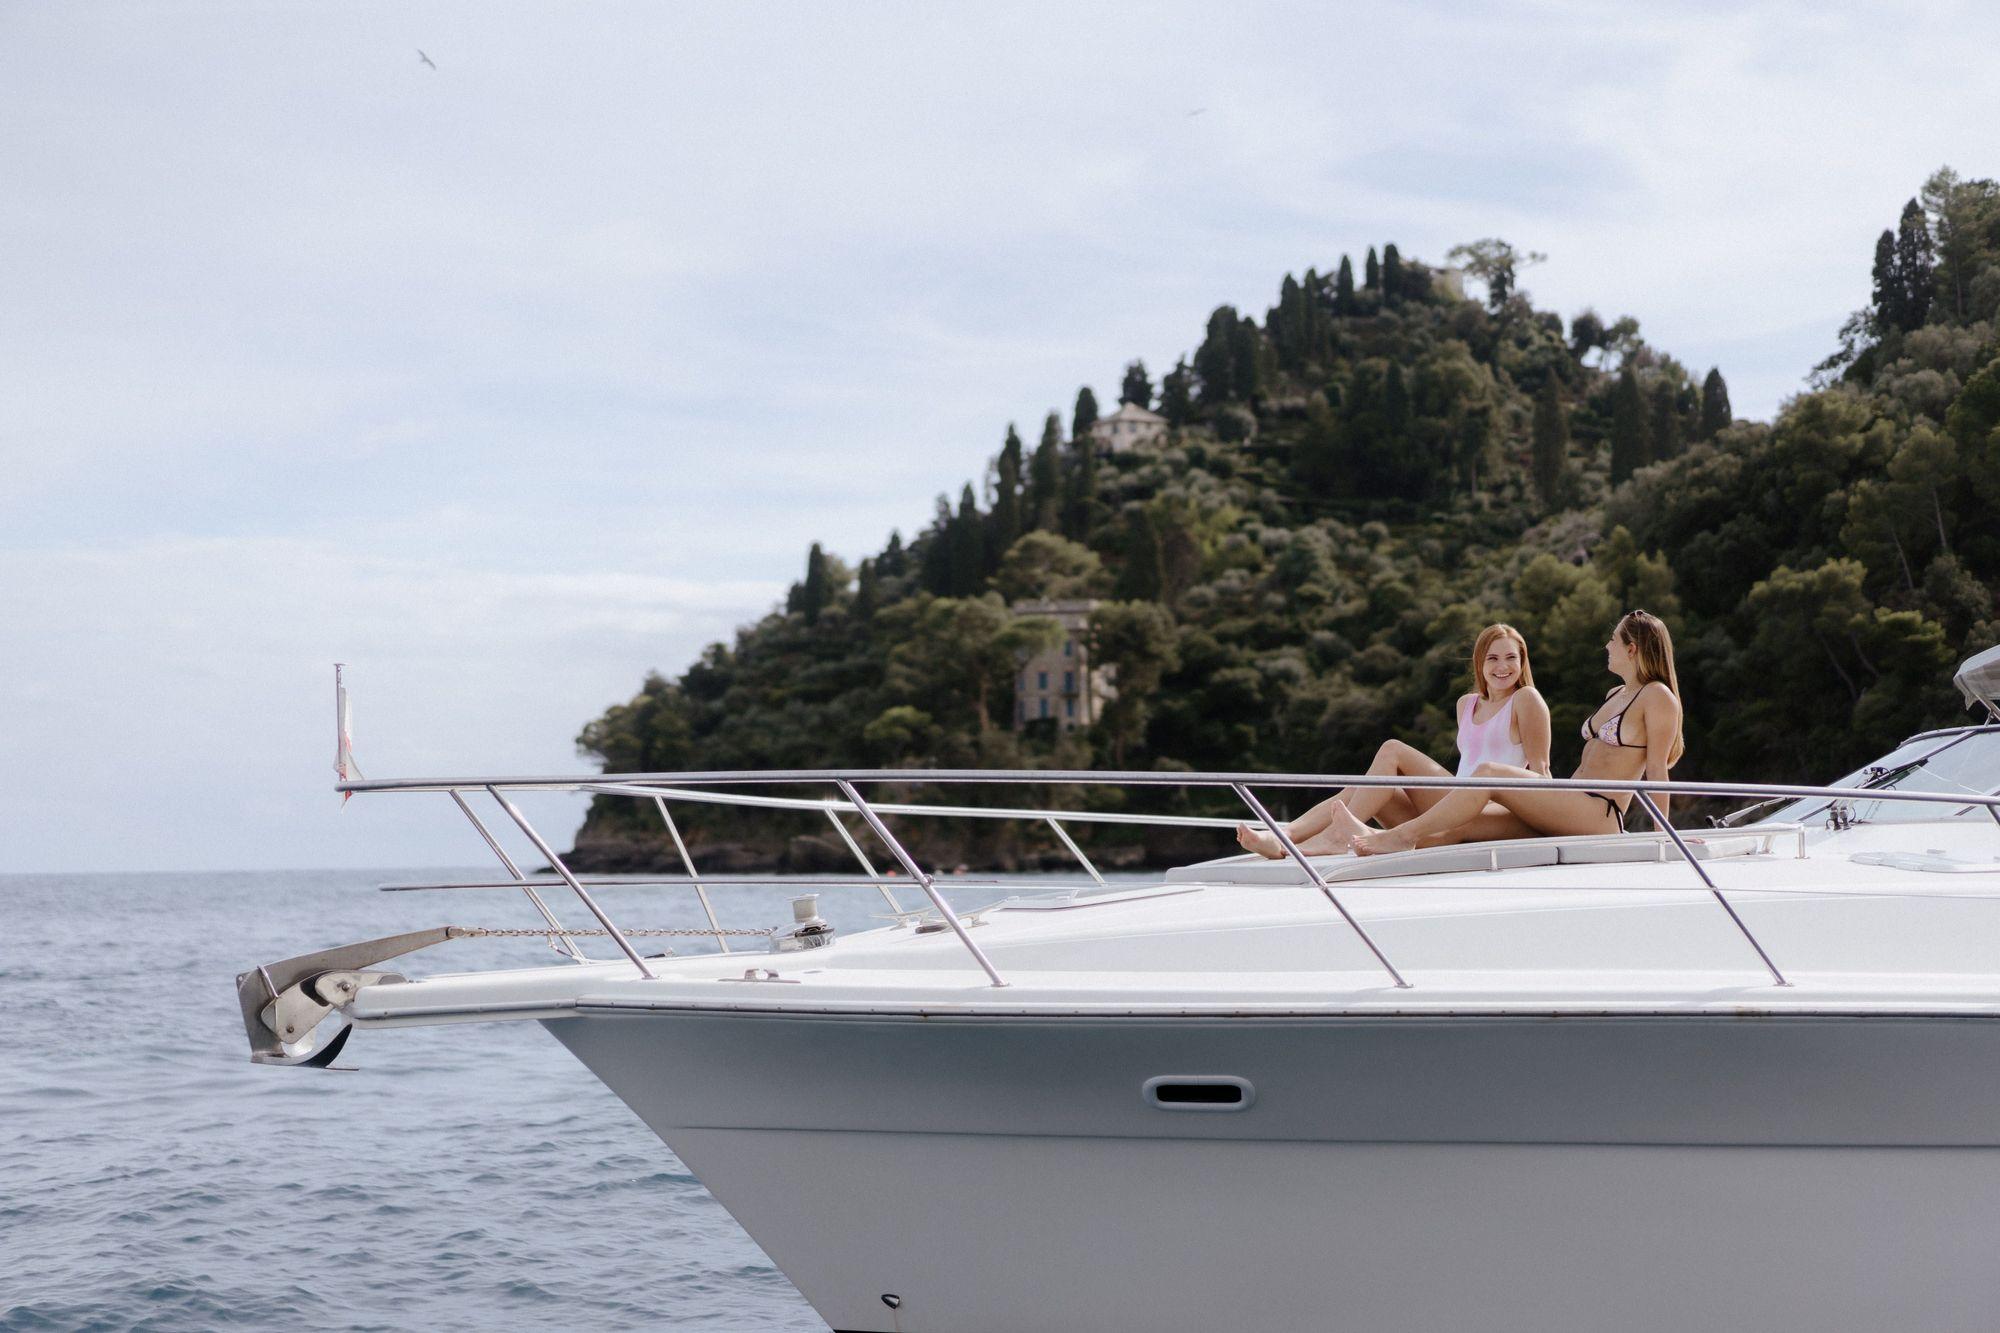 Cesare Charter Portofino - our maritime tour and trasnfer services